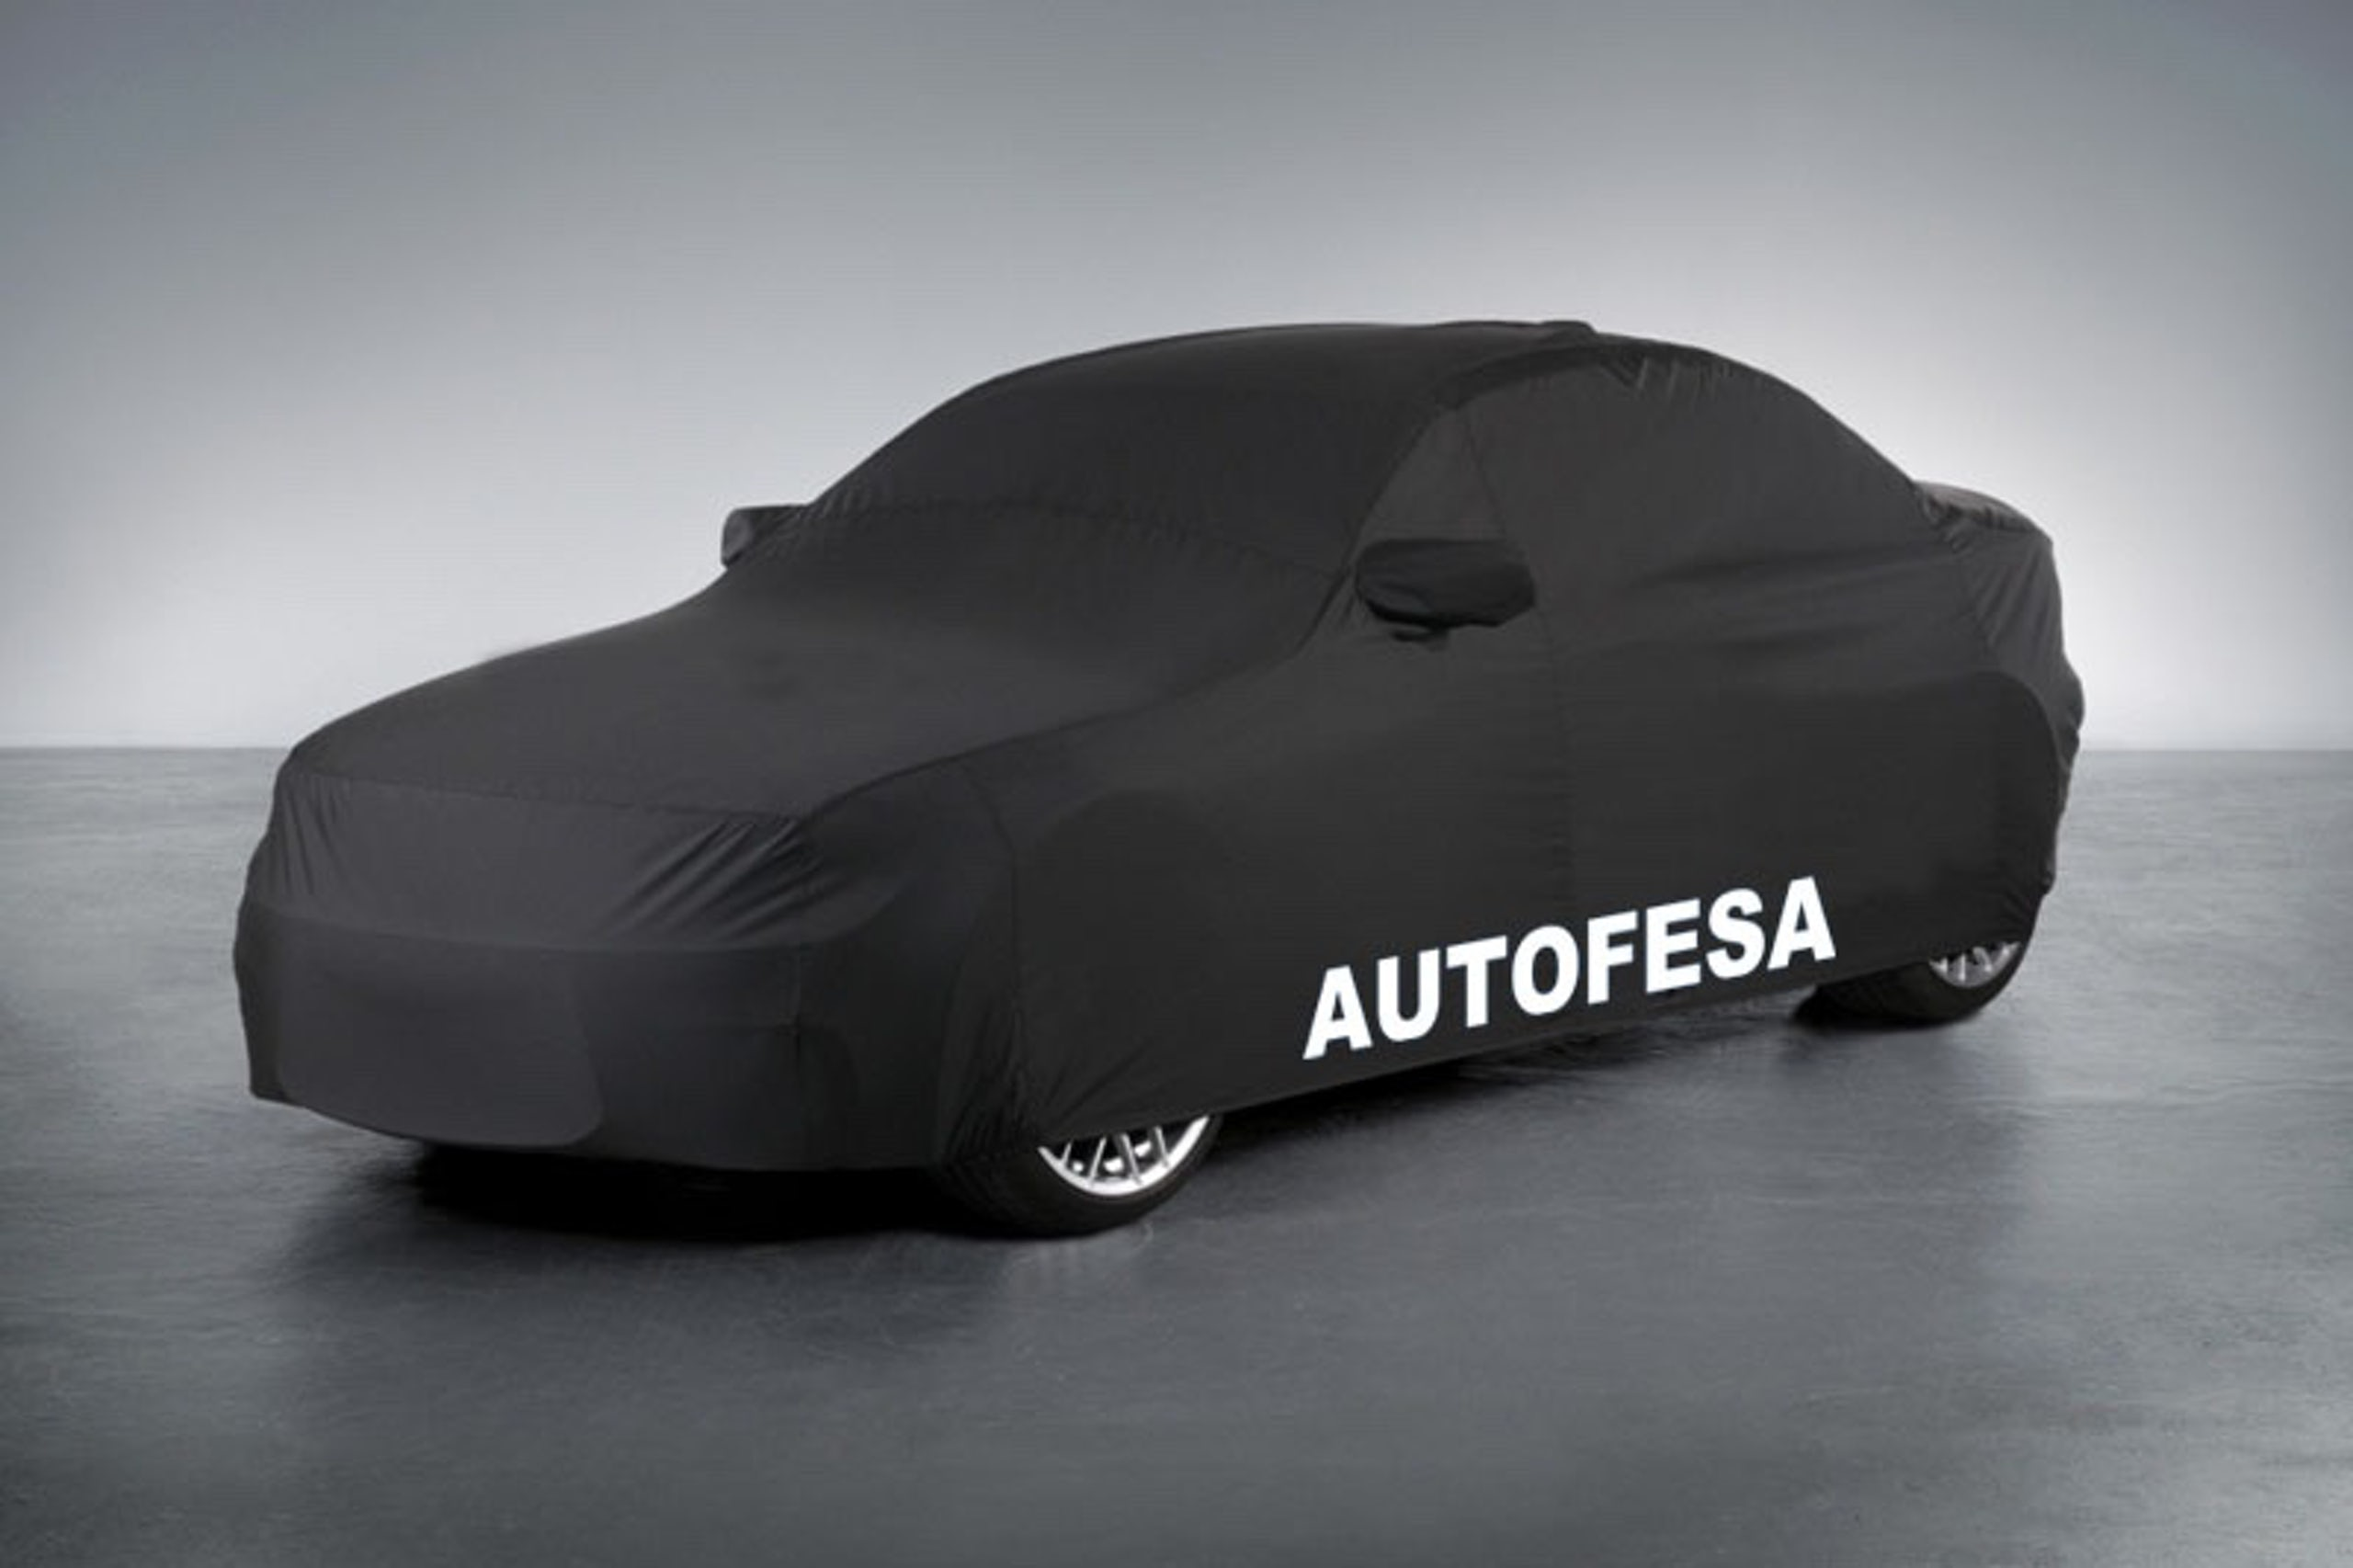 Lexus Nx 300h 300h 2.5 197cv Luxury 4WD 5p CVT Auto - Foto 24